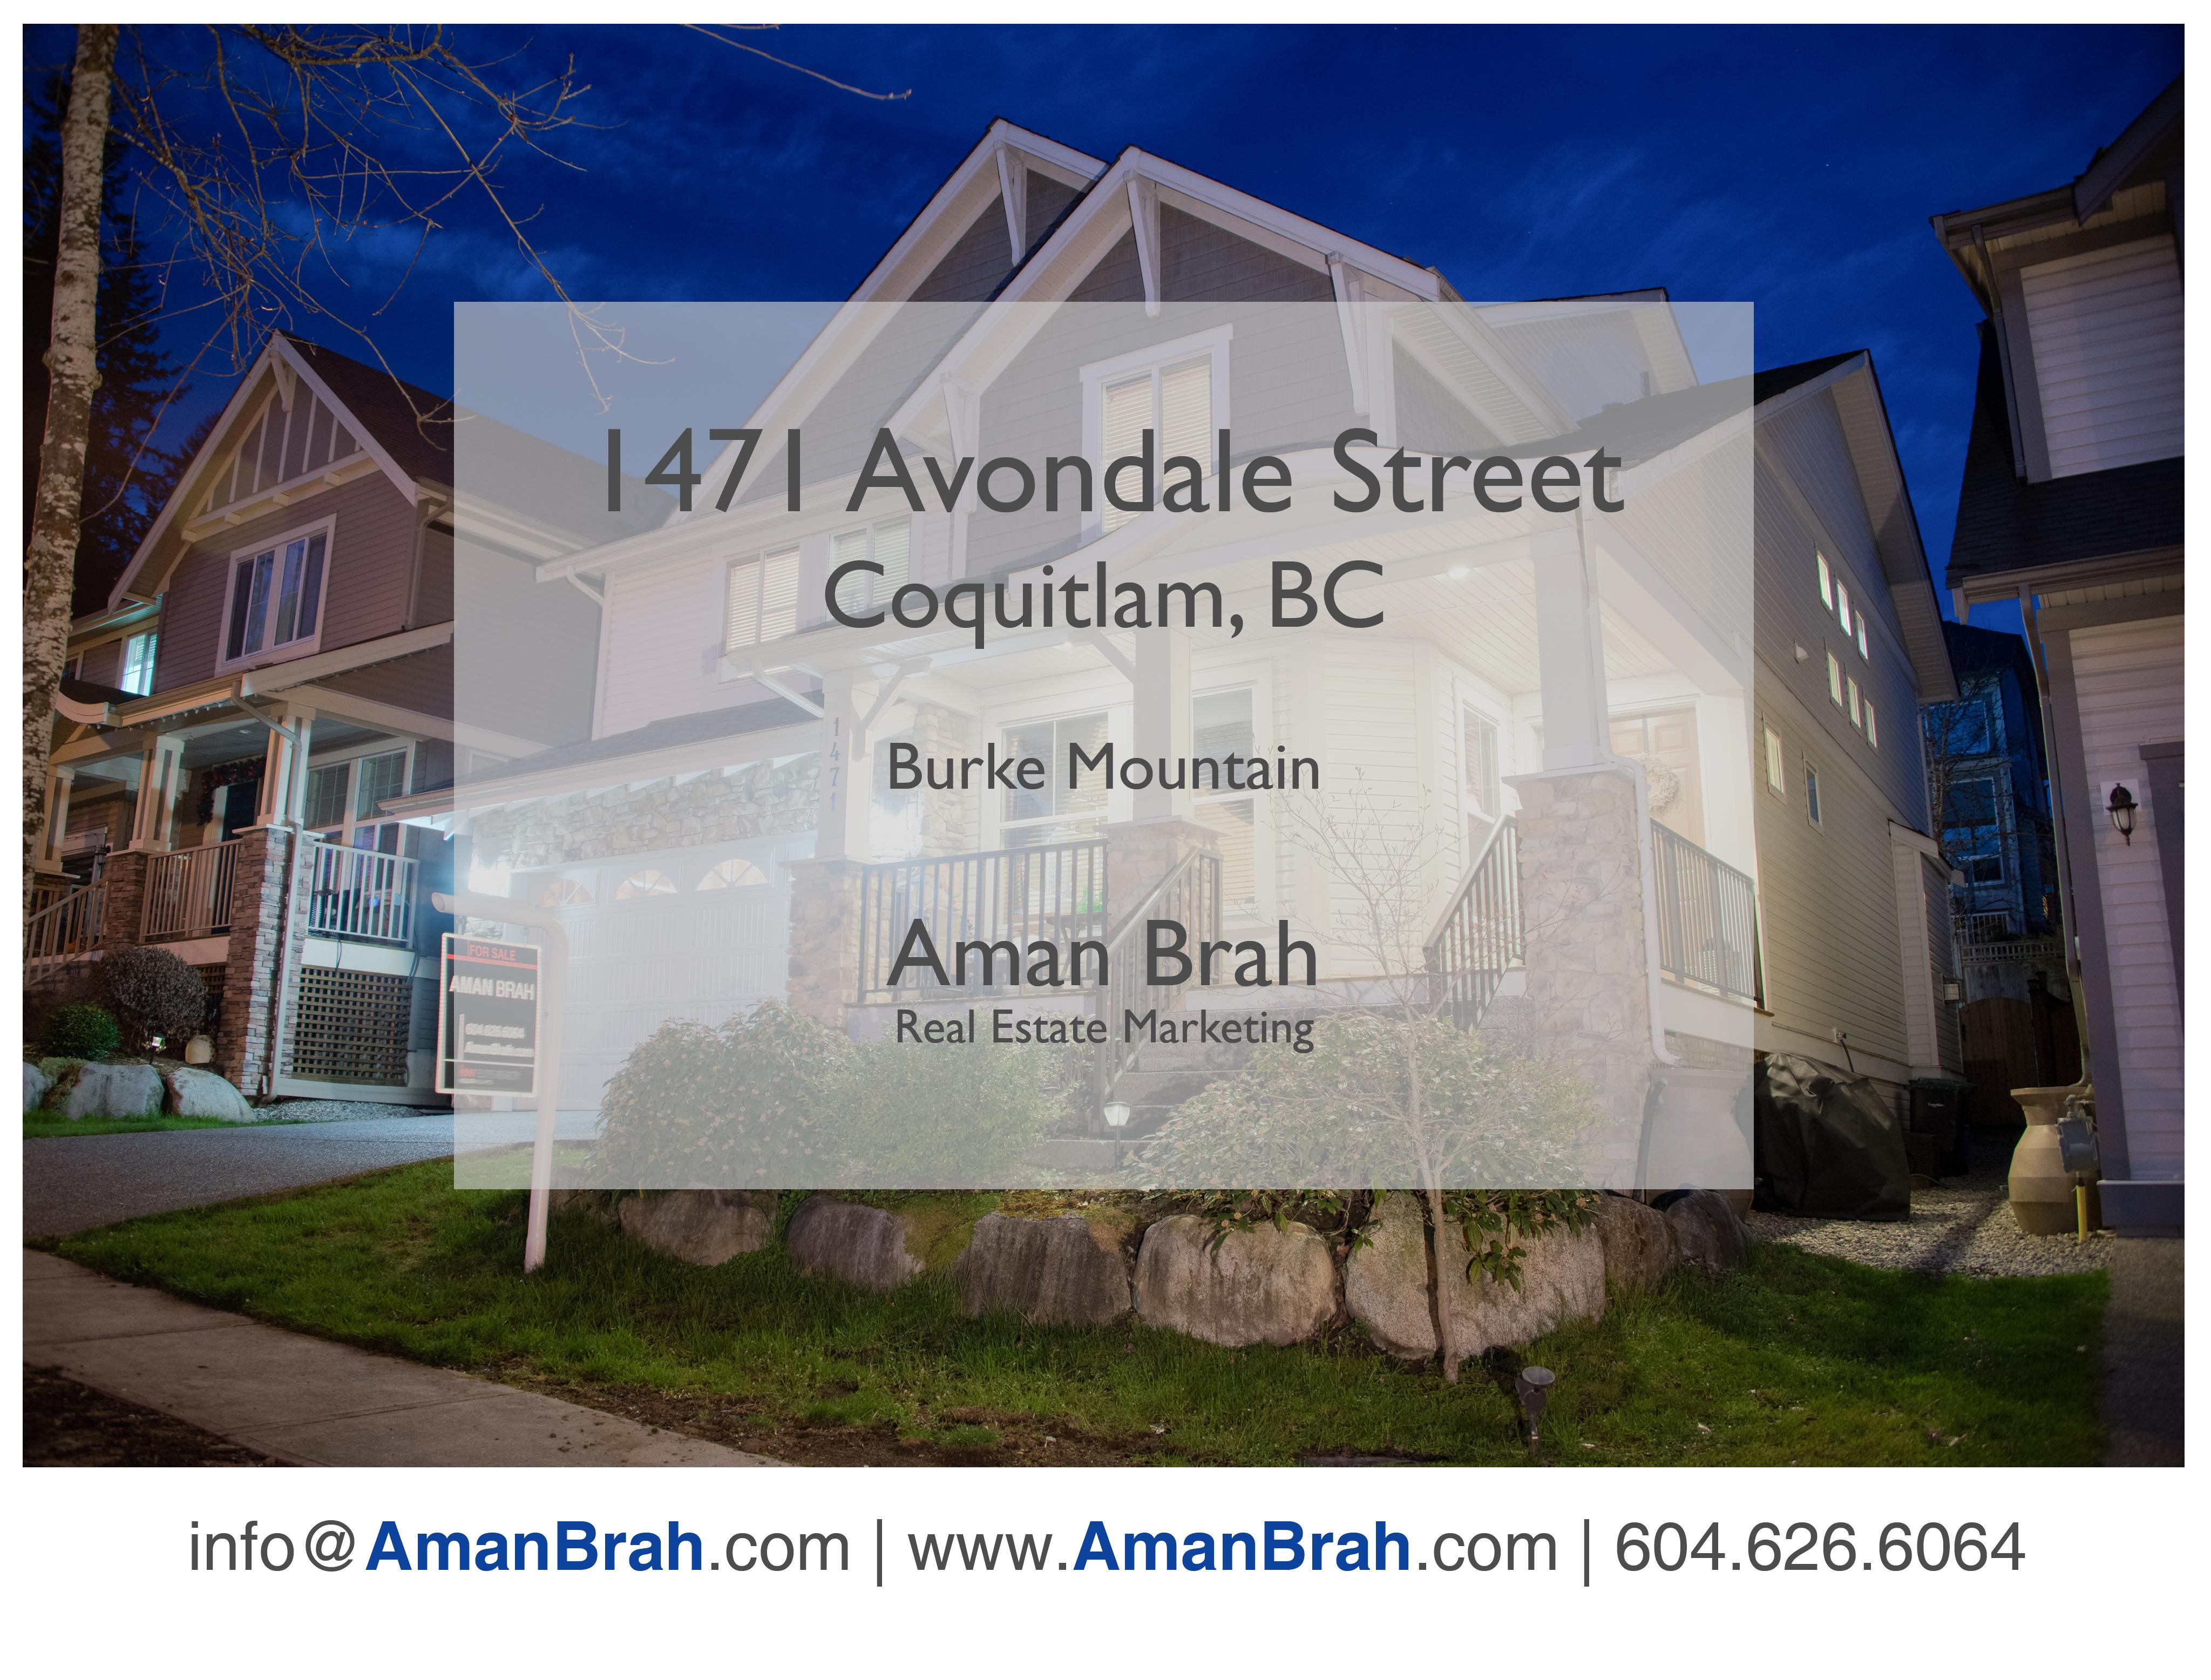 1471 Avondale Street, Coquitlam – Burke Mountain, Coquitlam